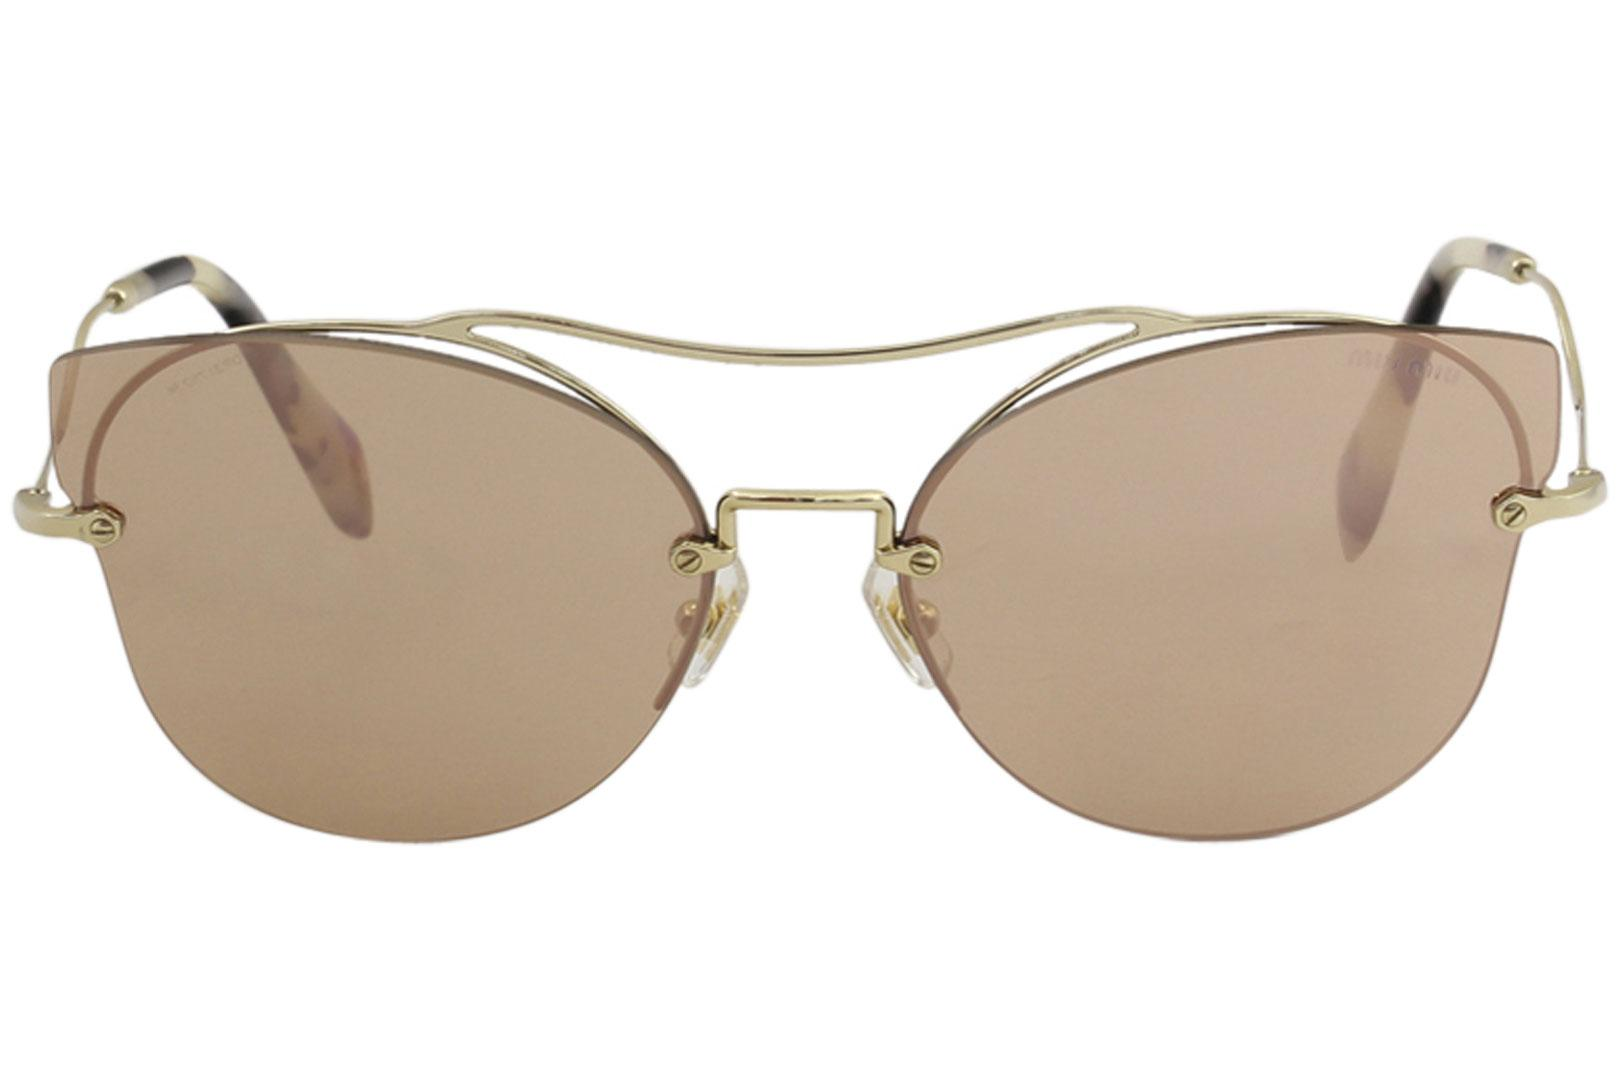 36ce08c1f74 Miu Miu Women s SMU52S SMU 52S Fashion Cat Eye Sunglasses